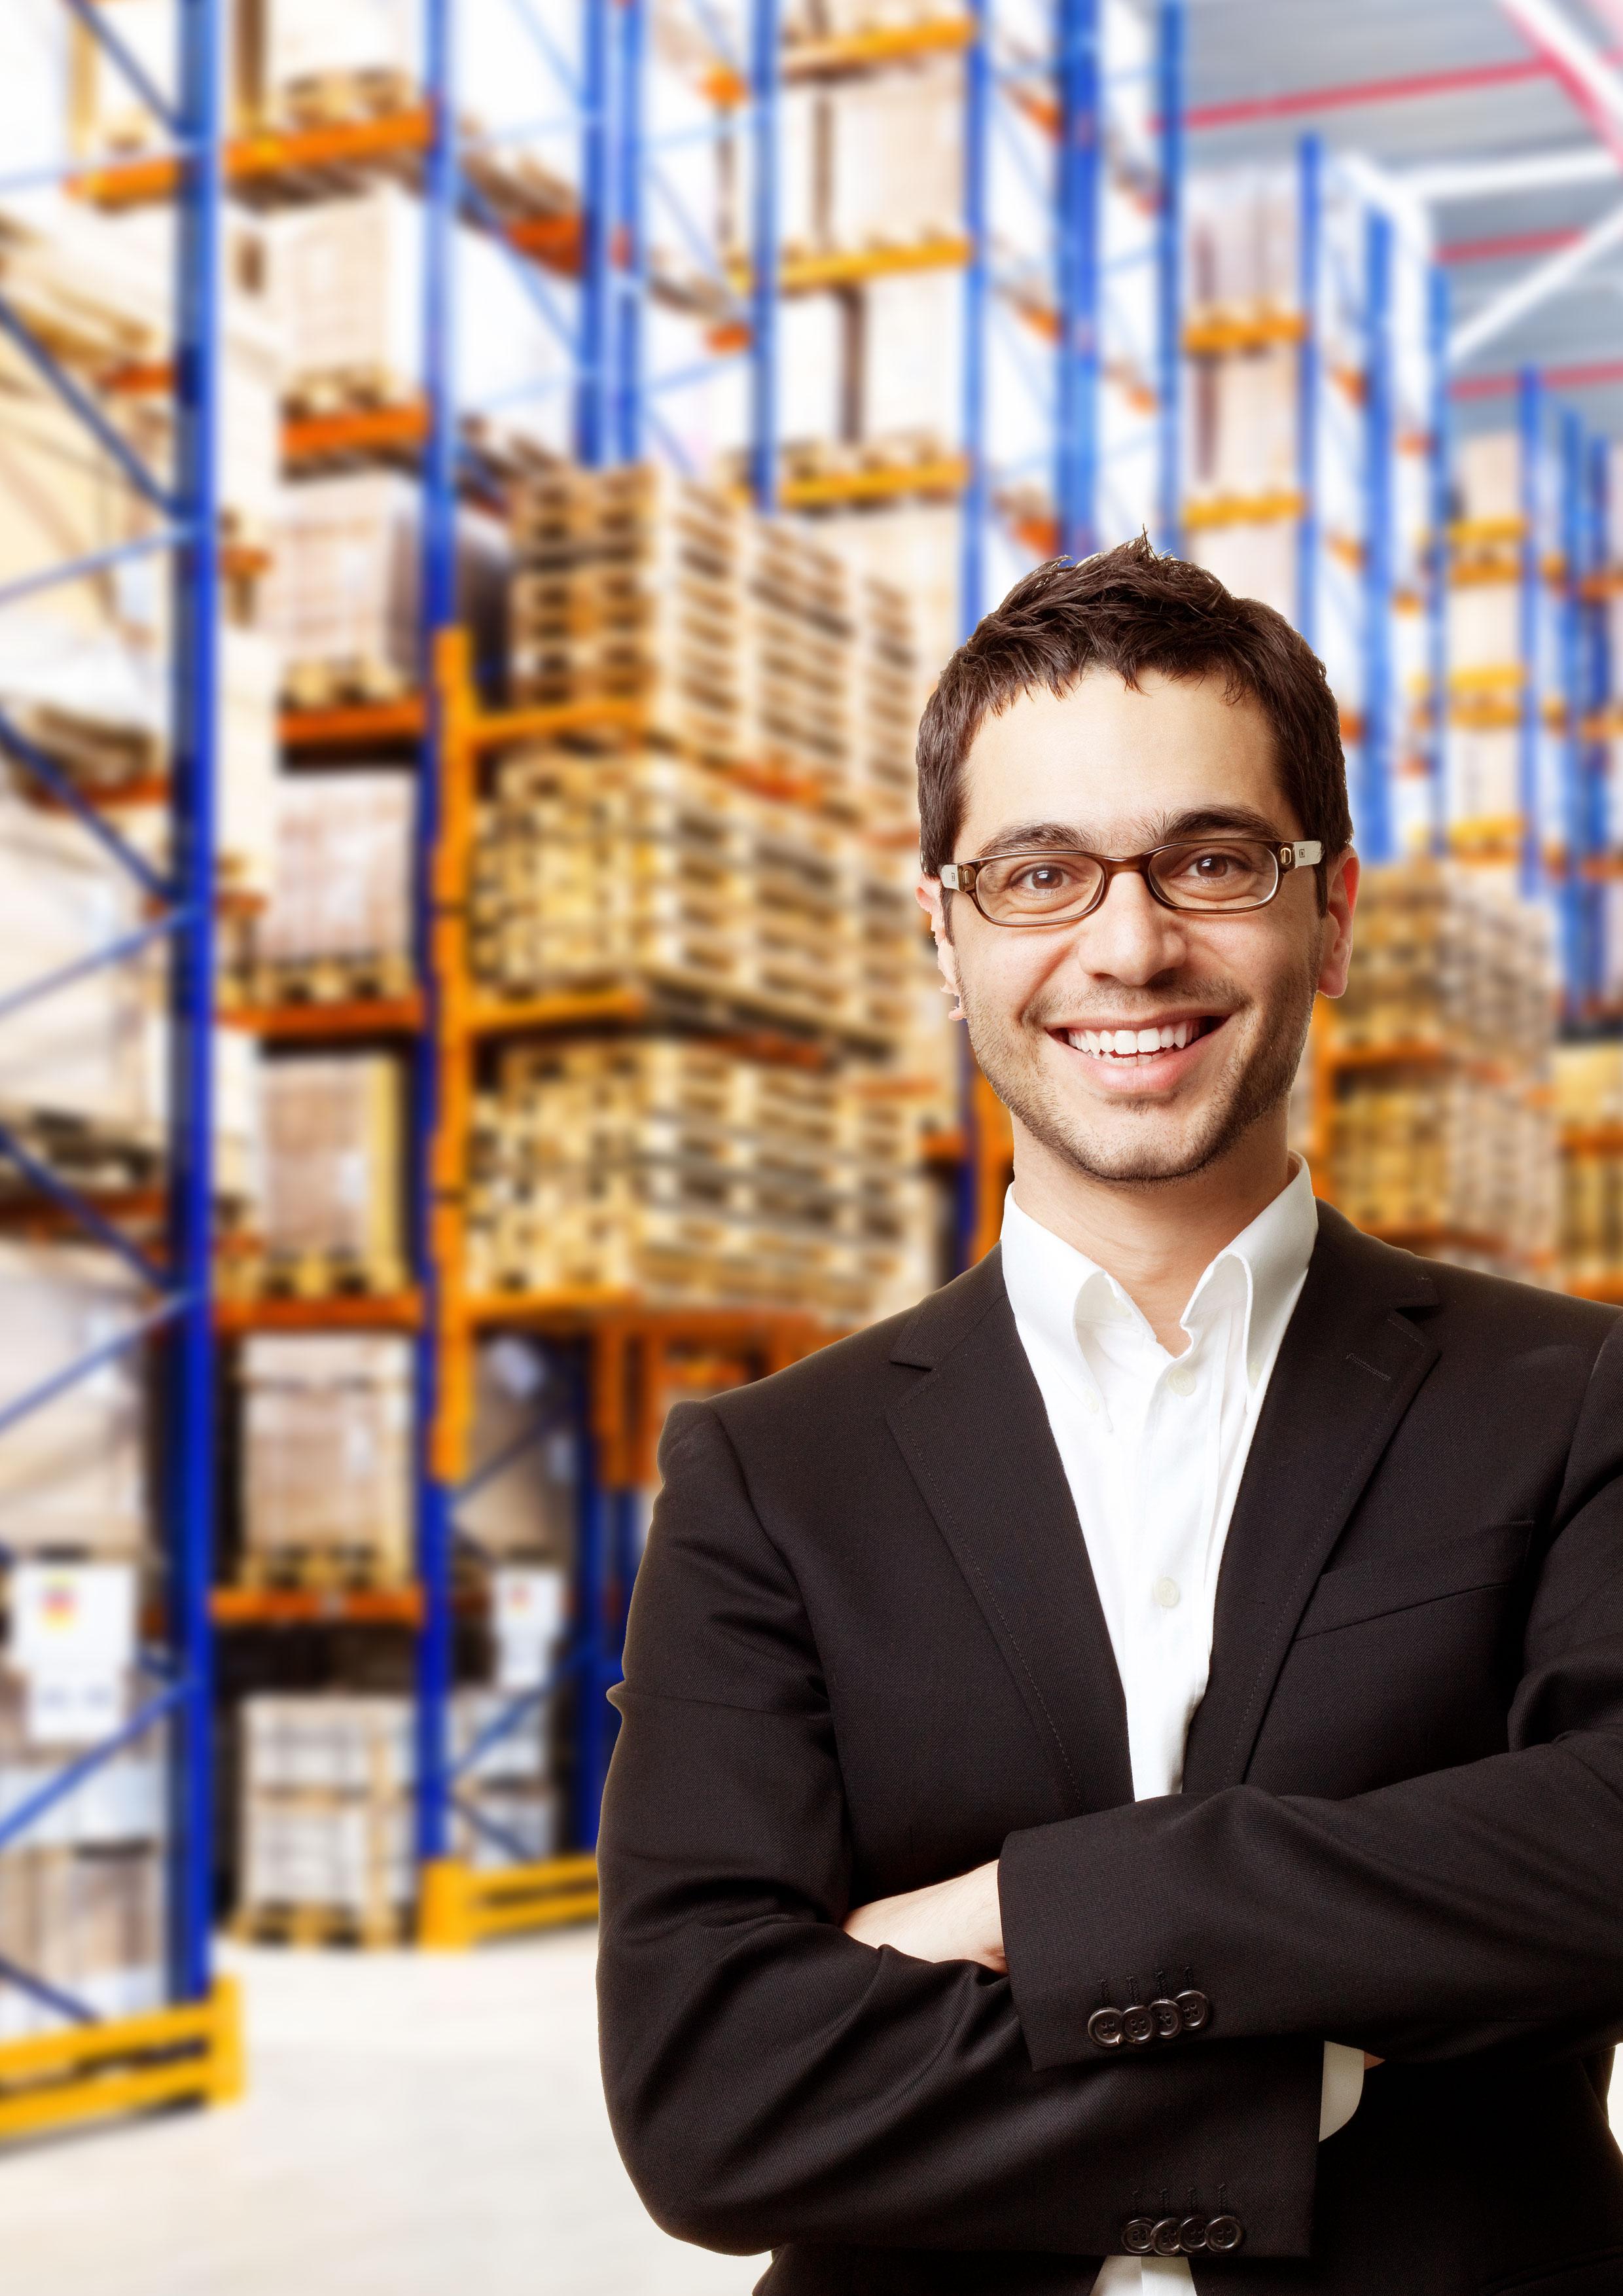 Warehouse Operations and Management Training Courses - Dubai